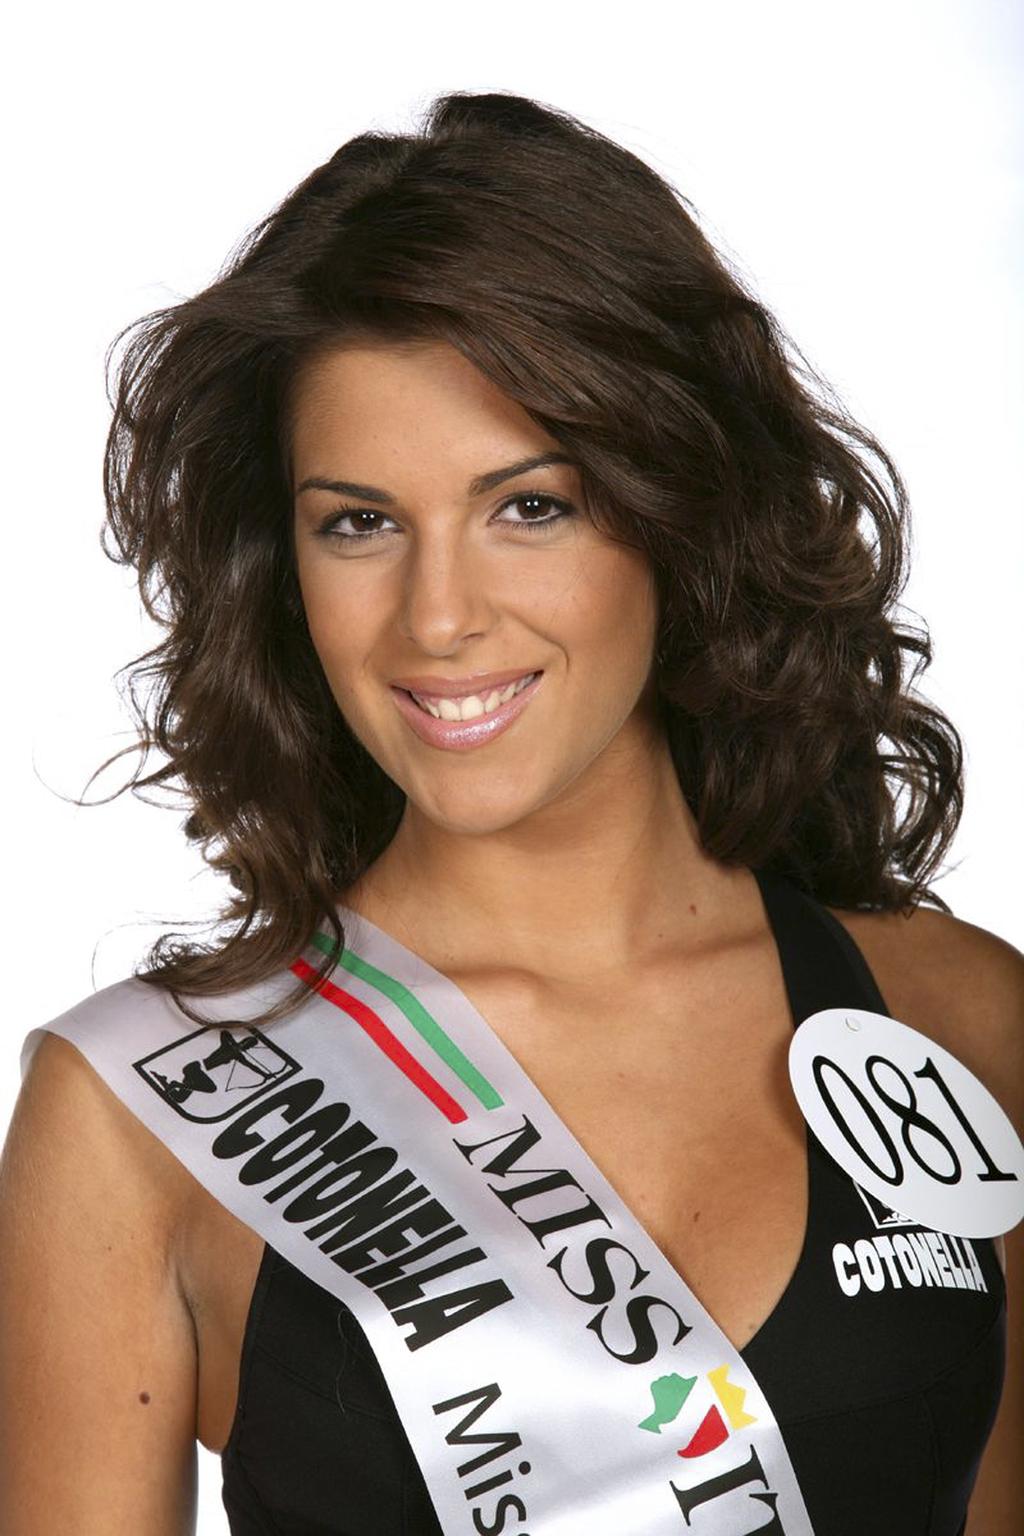 In this photo taken on Sept, 8, 2007, Miss Romagna 2007 winner Gessica Notaro, victim of an acid attack. A rebellion against gender vio...